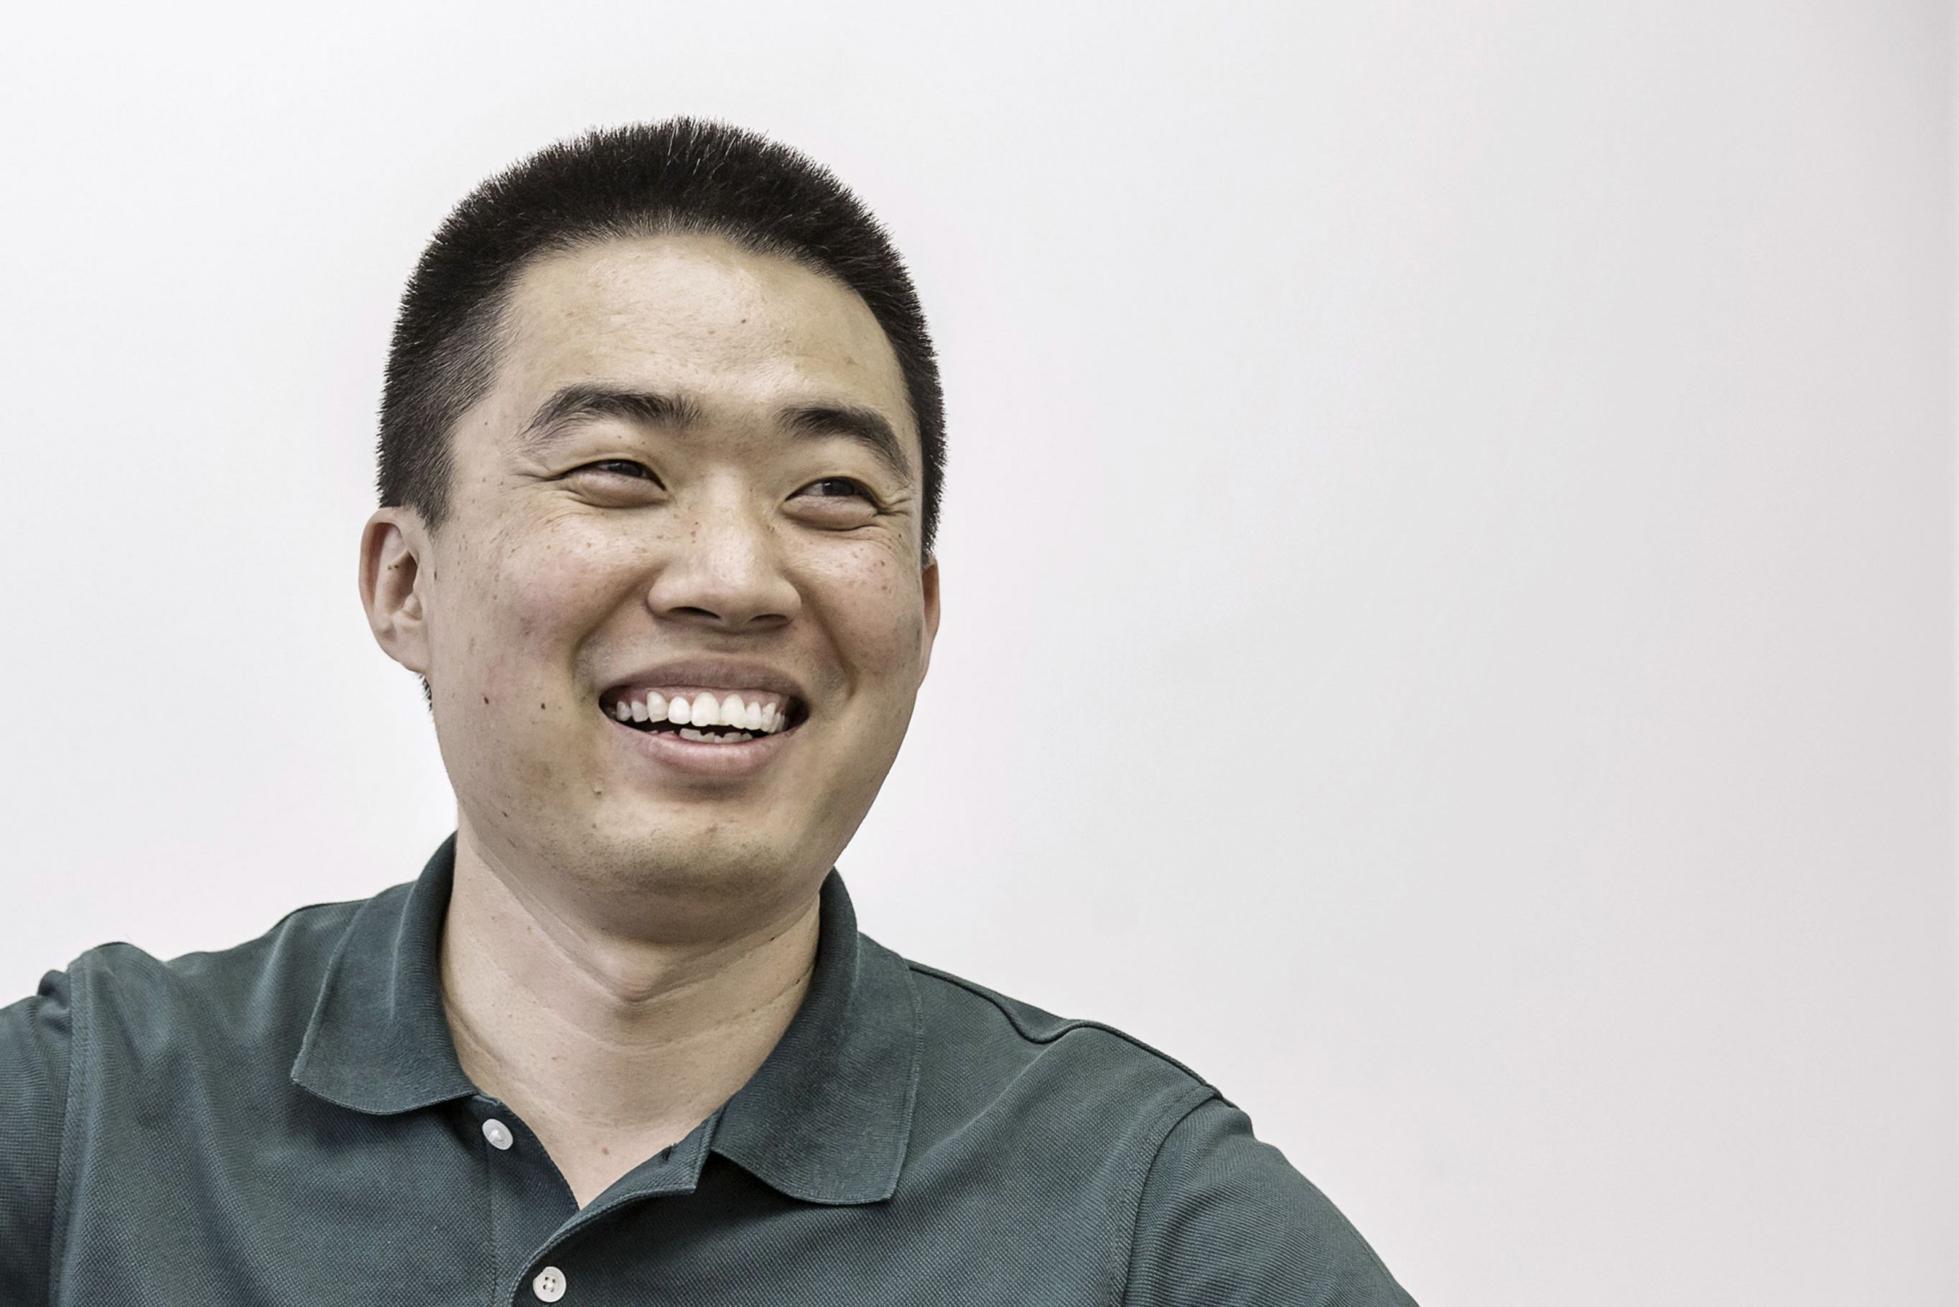 Electric-Vehicle Startup Chehejia Founder Li Xiang Interview